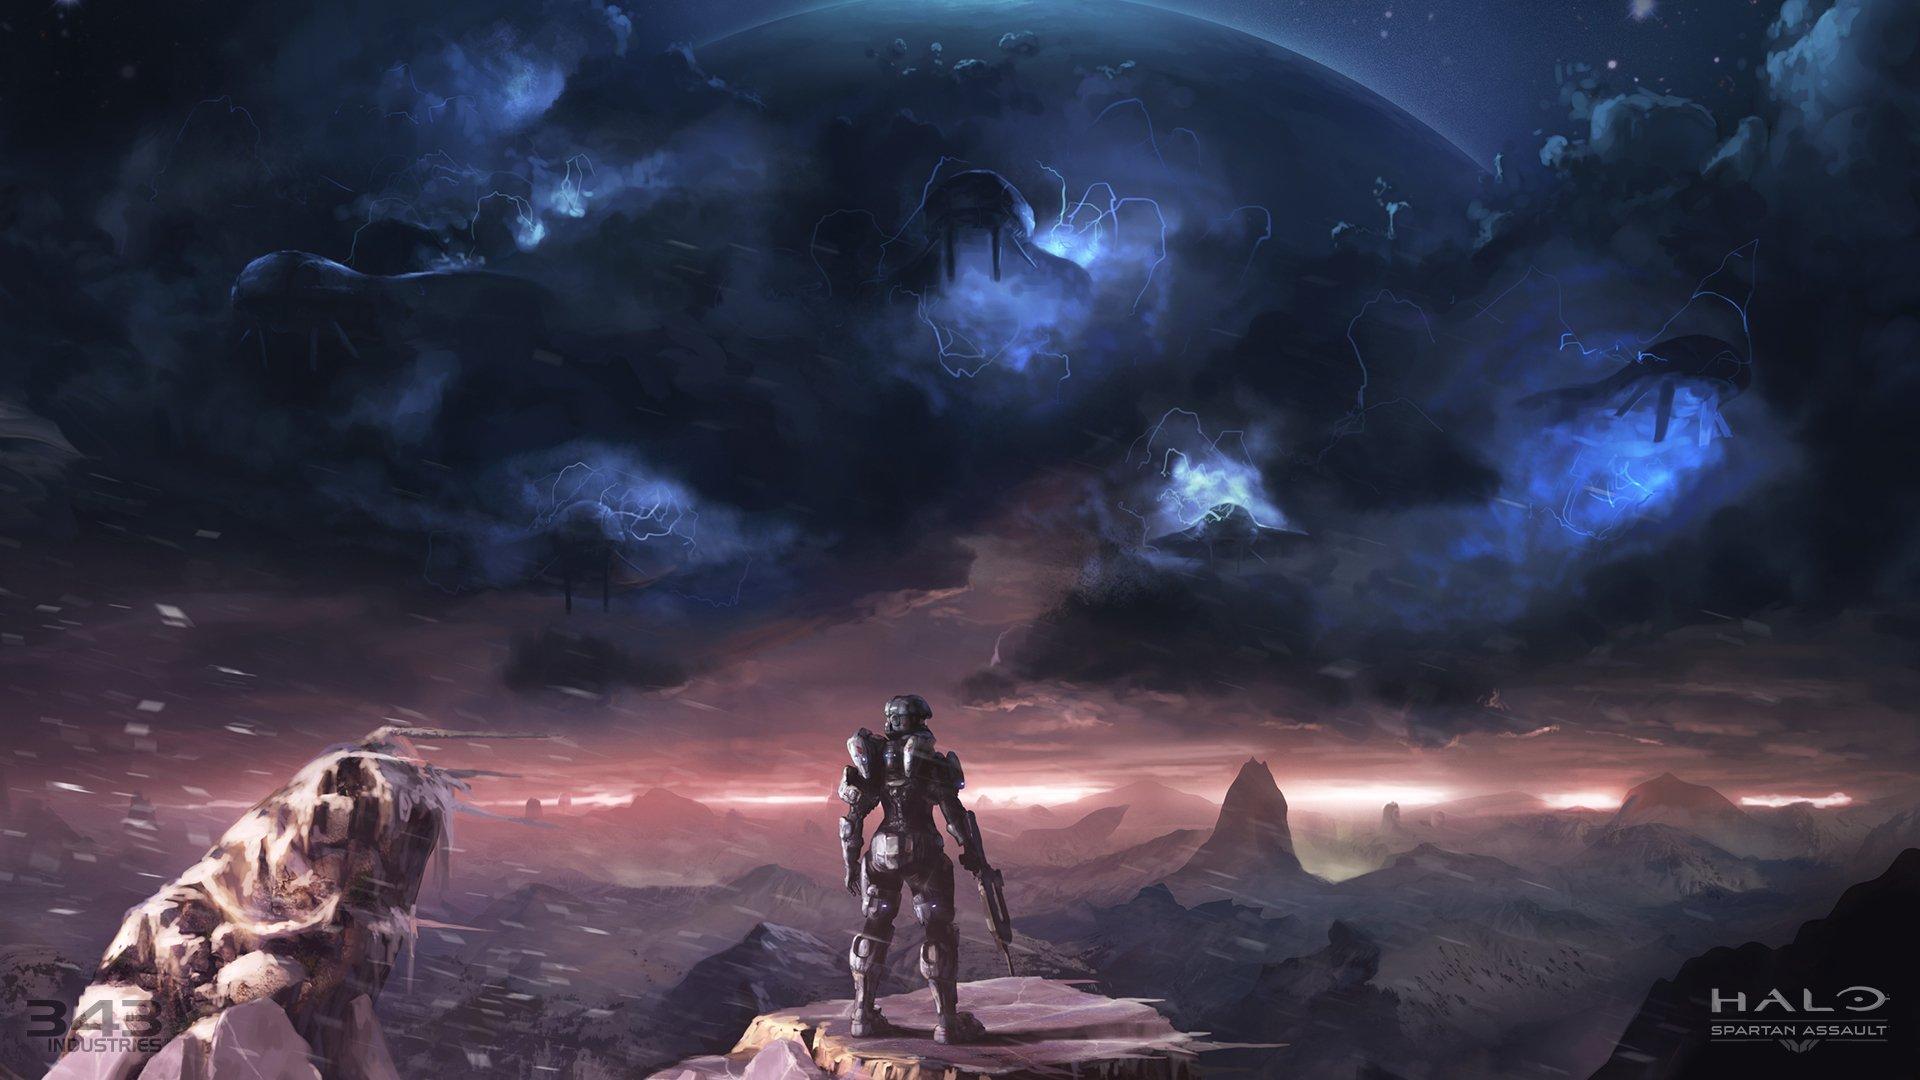 Video Game - Halo: Spartan Assault  Wallpaper